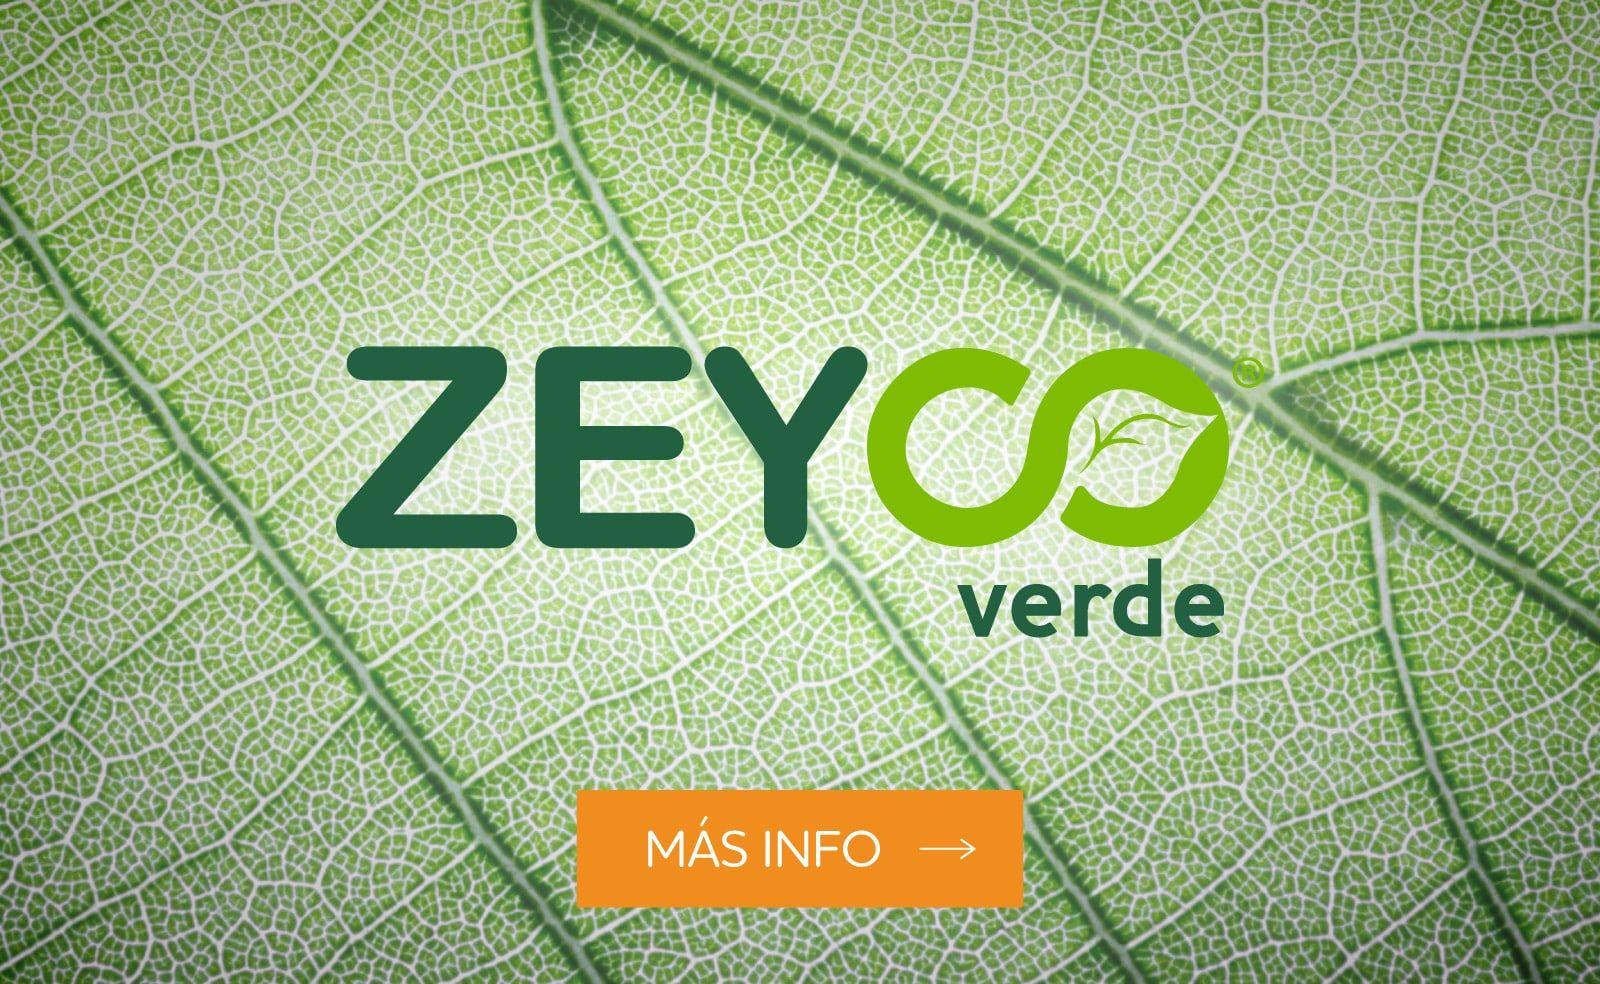 Zeyco Verde materiales dentales Home zeyco verde 1